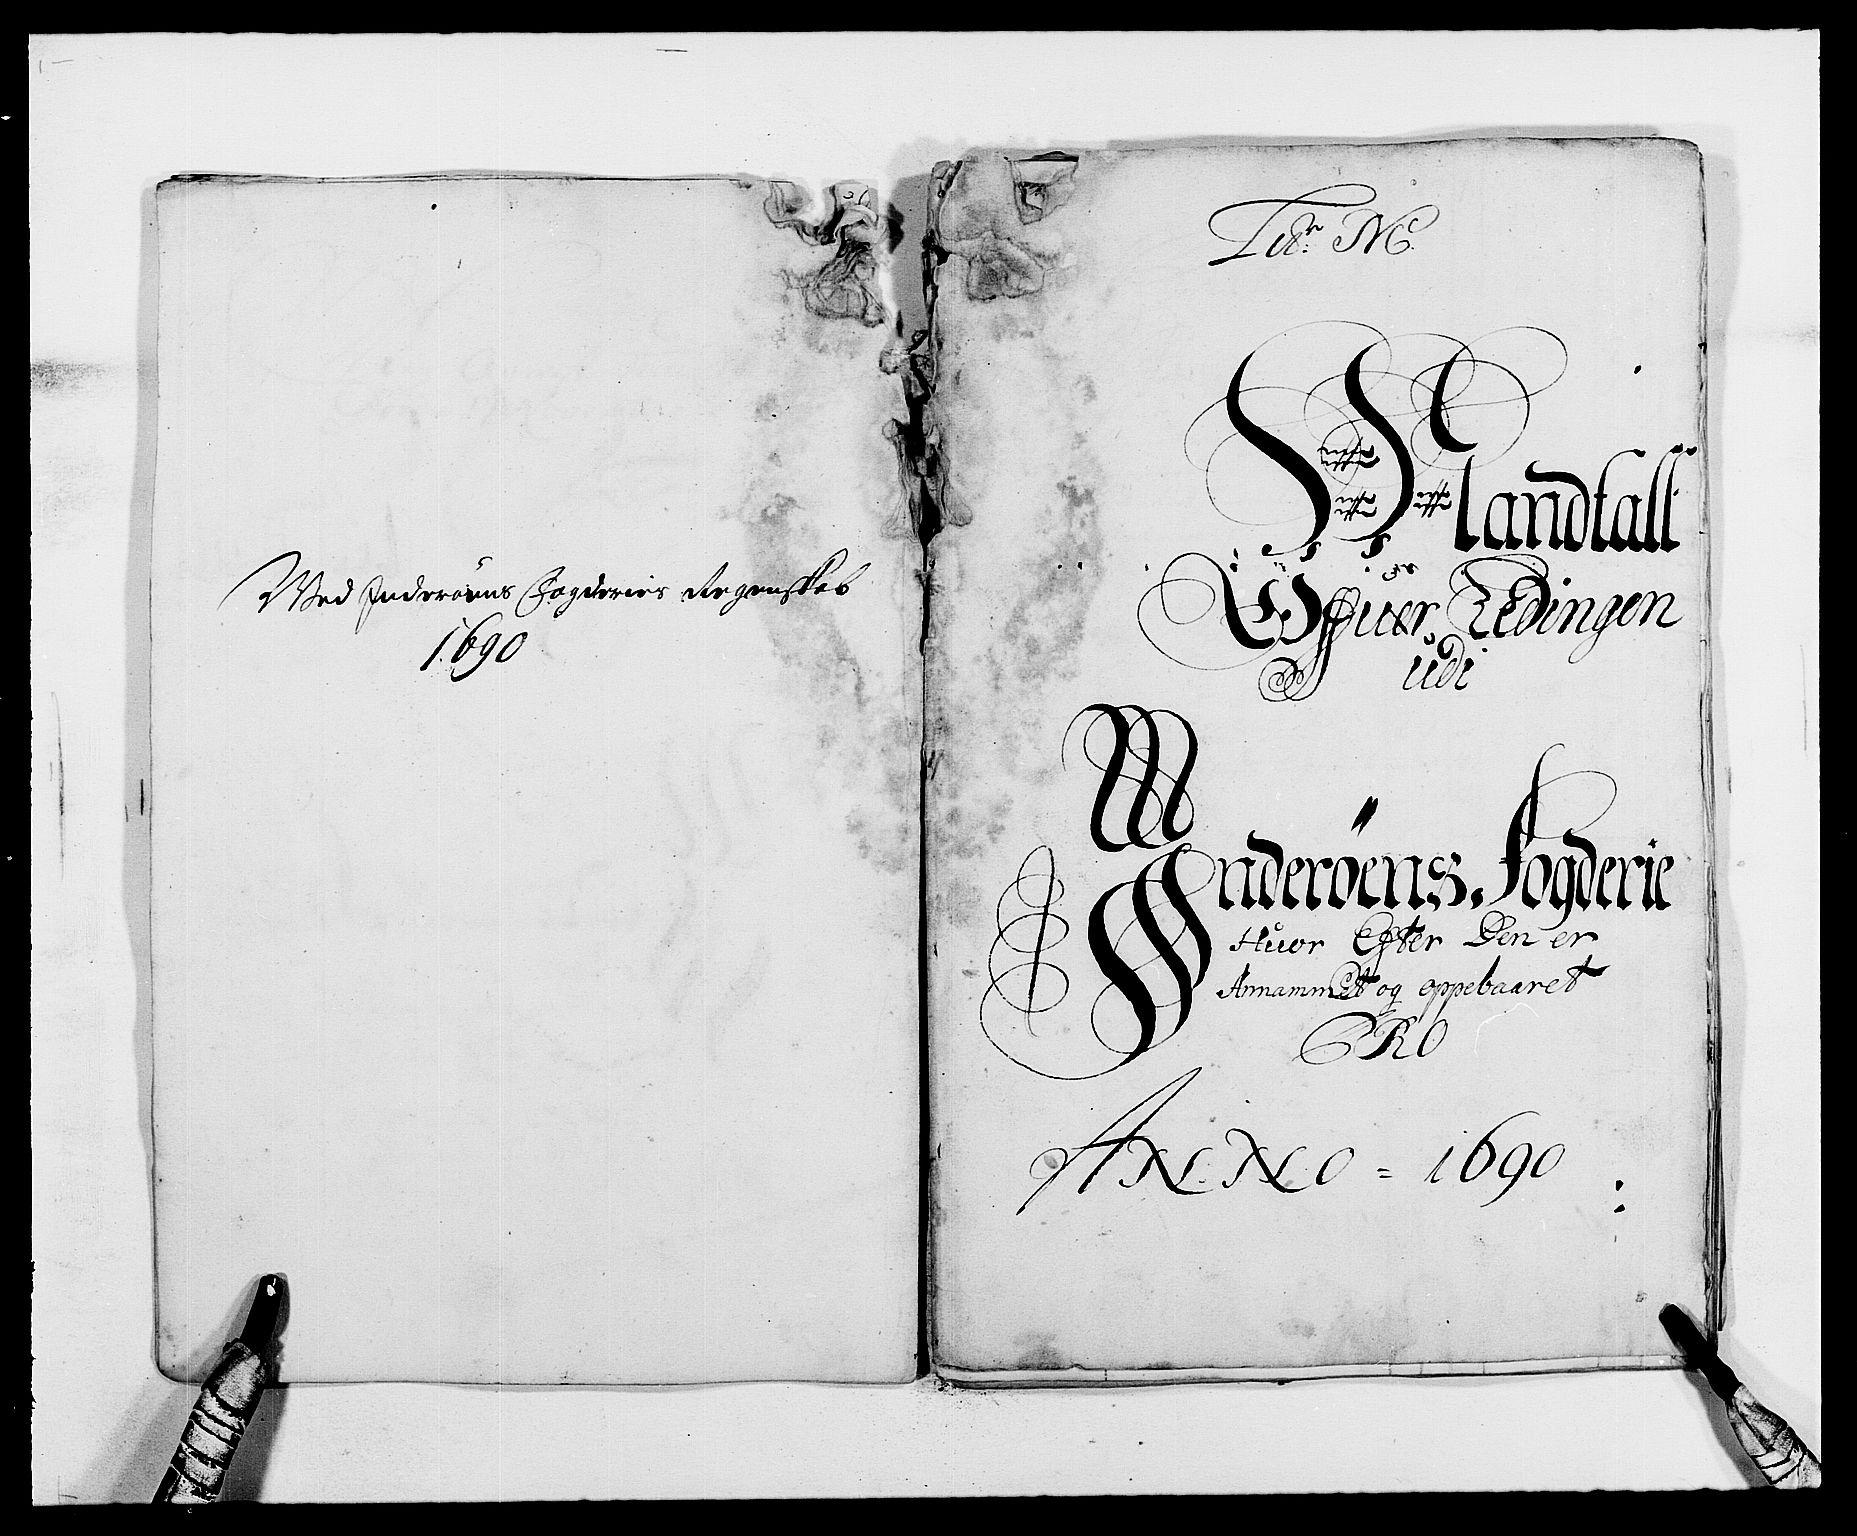 RA, Rentekammeret inntil 1814, Reviderte regnskaper, Fogderegnskap, R63/L4307: Fogderegnskap Inderøy, 1690-1691, s. 155